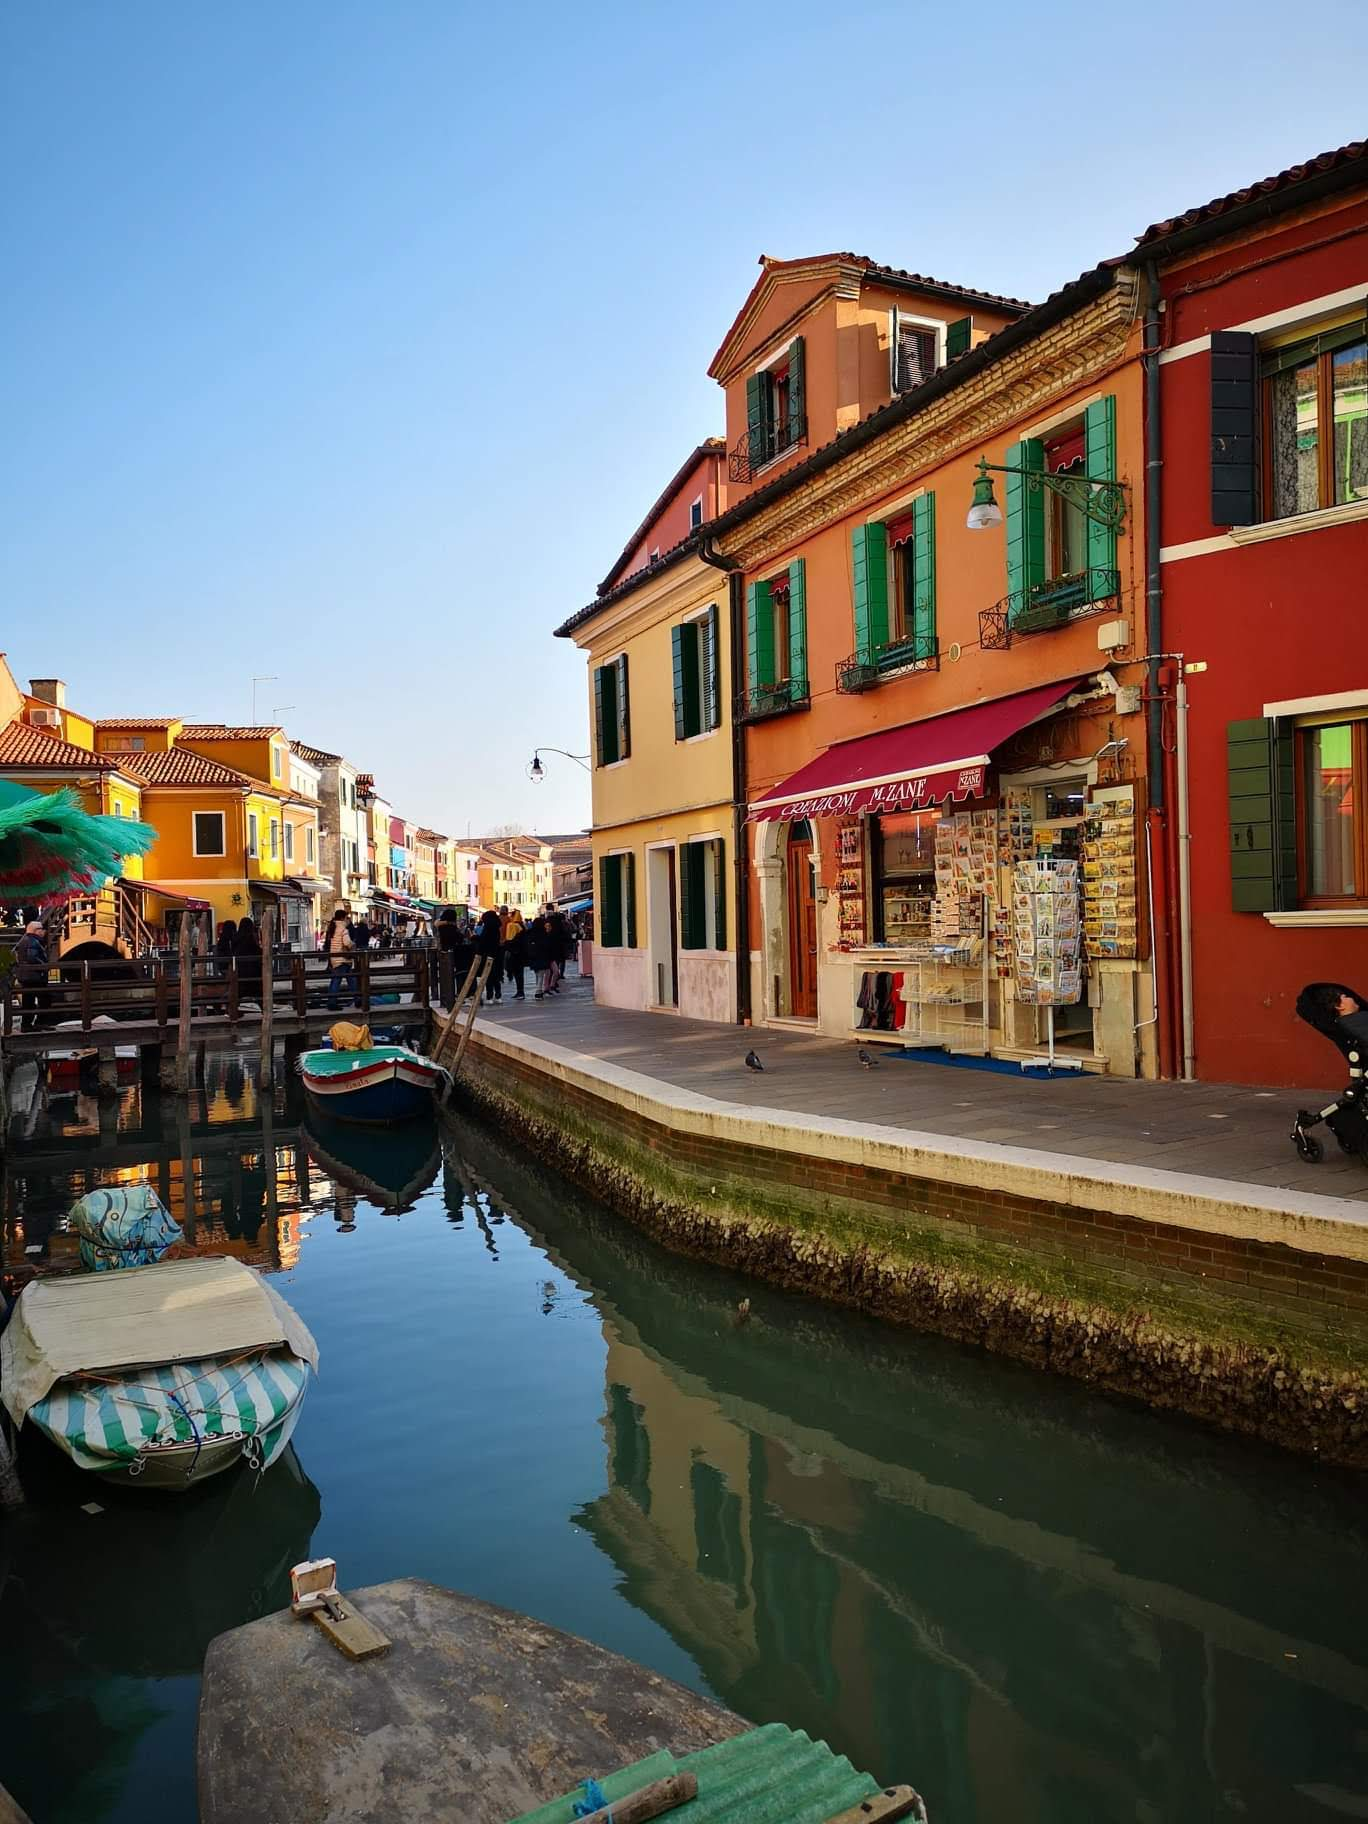 anima veneziana burano